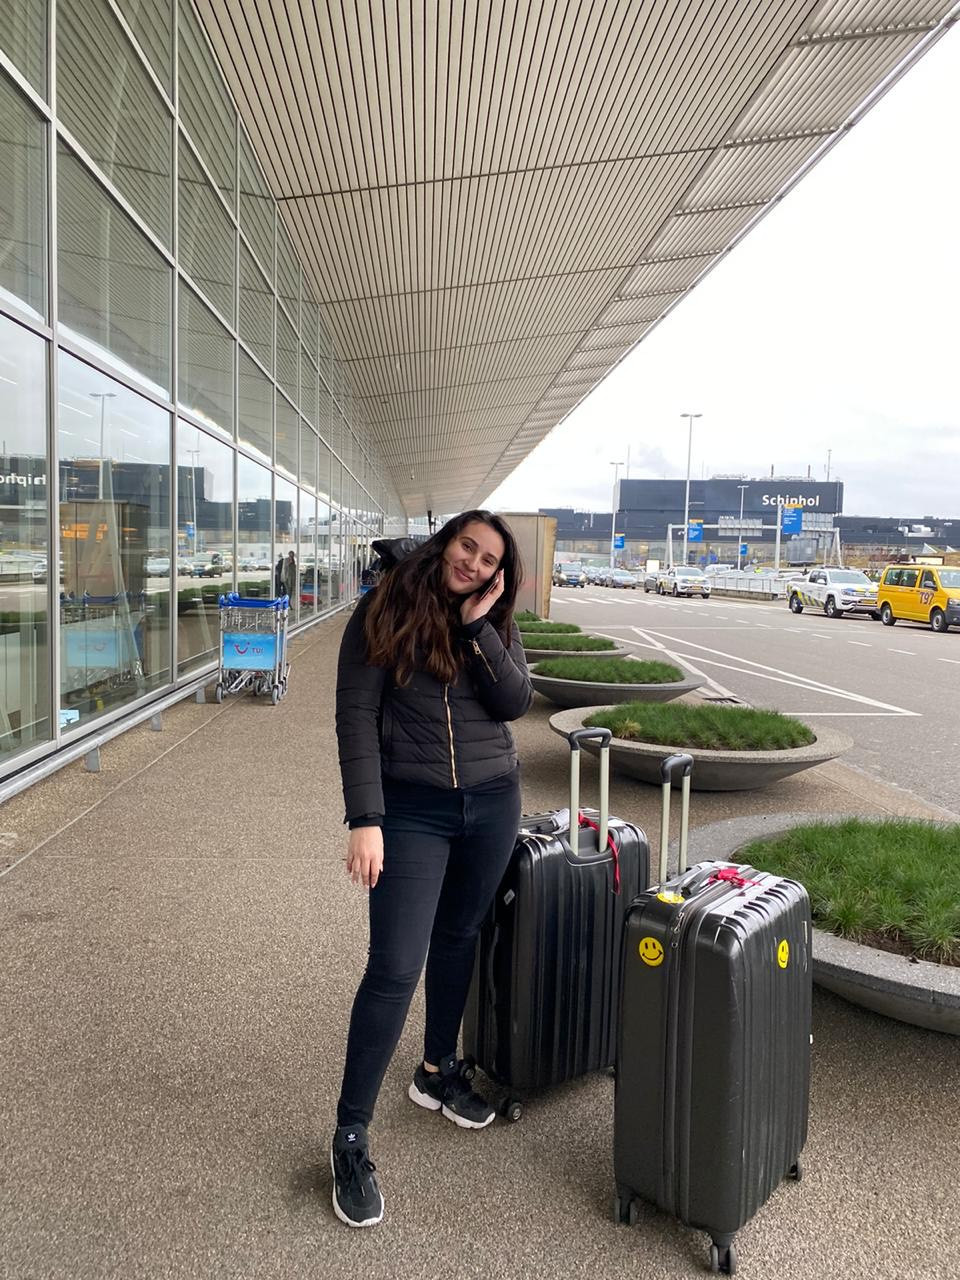 Me outside Schiphol